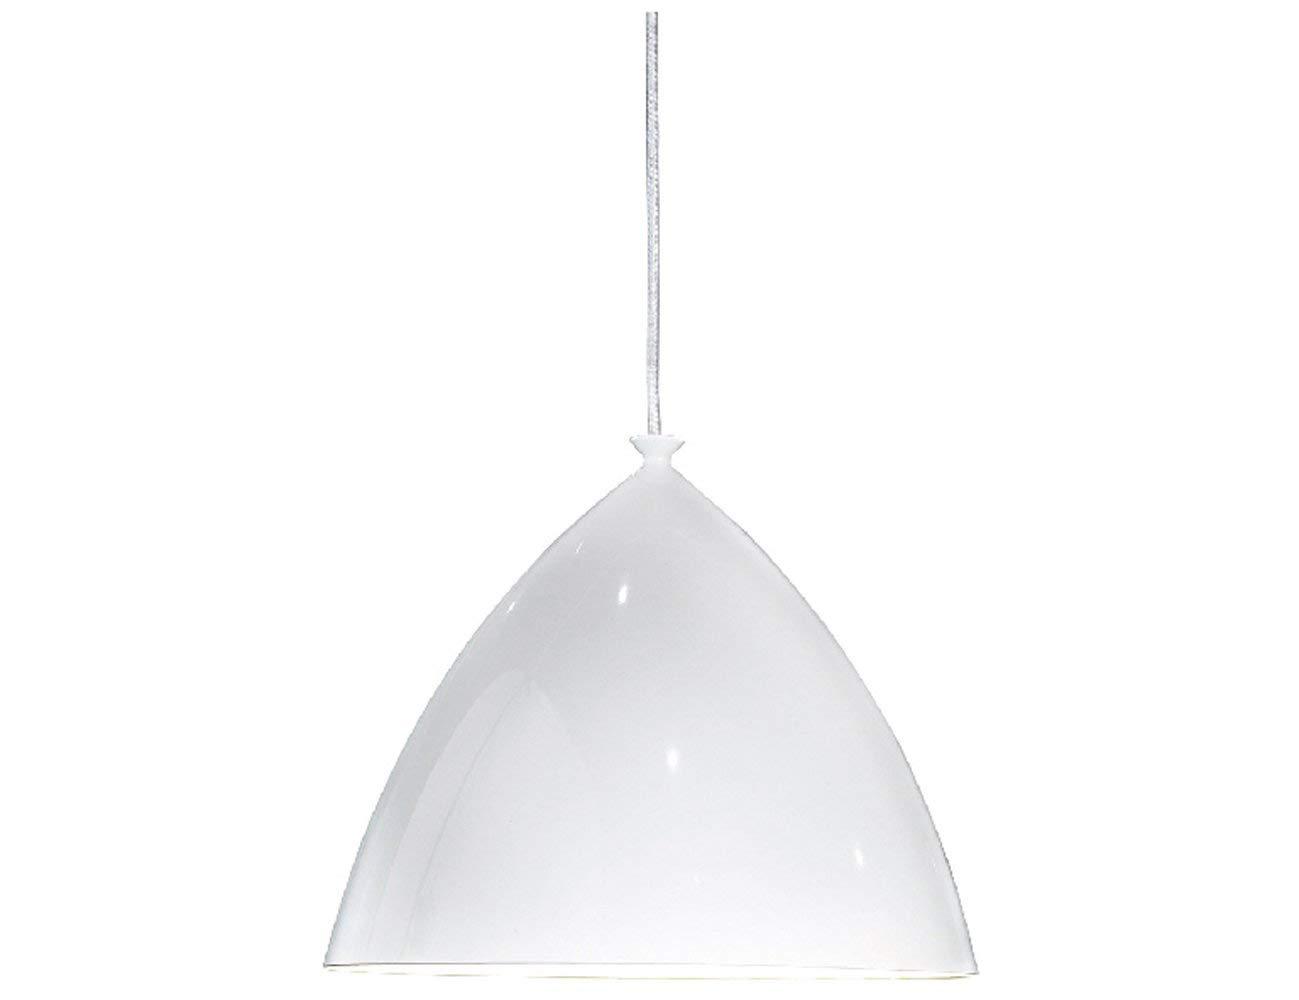 Nordlux Pendelleuchte Slope 35 60W E27 weiß 71723010